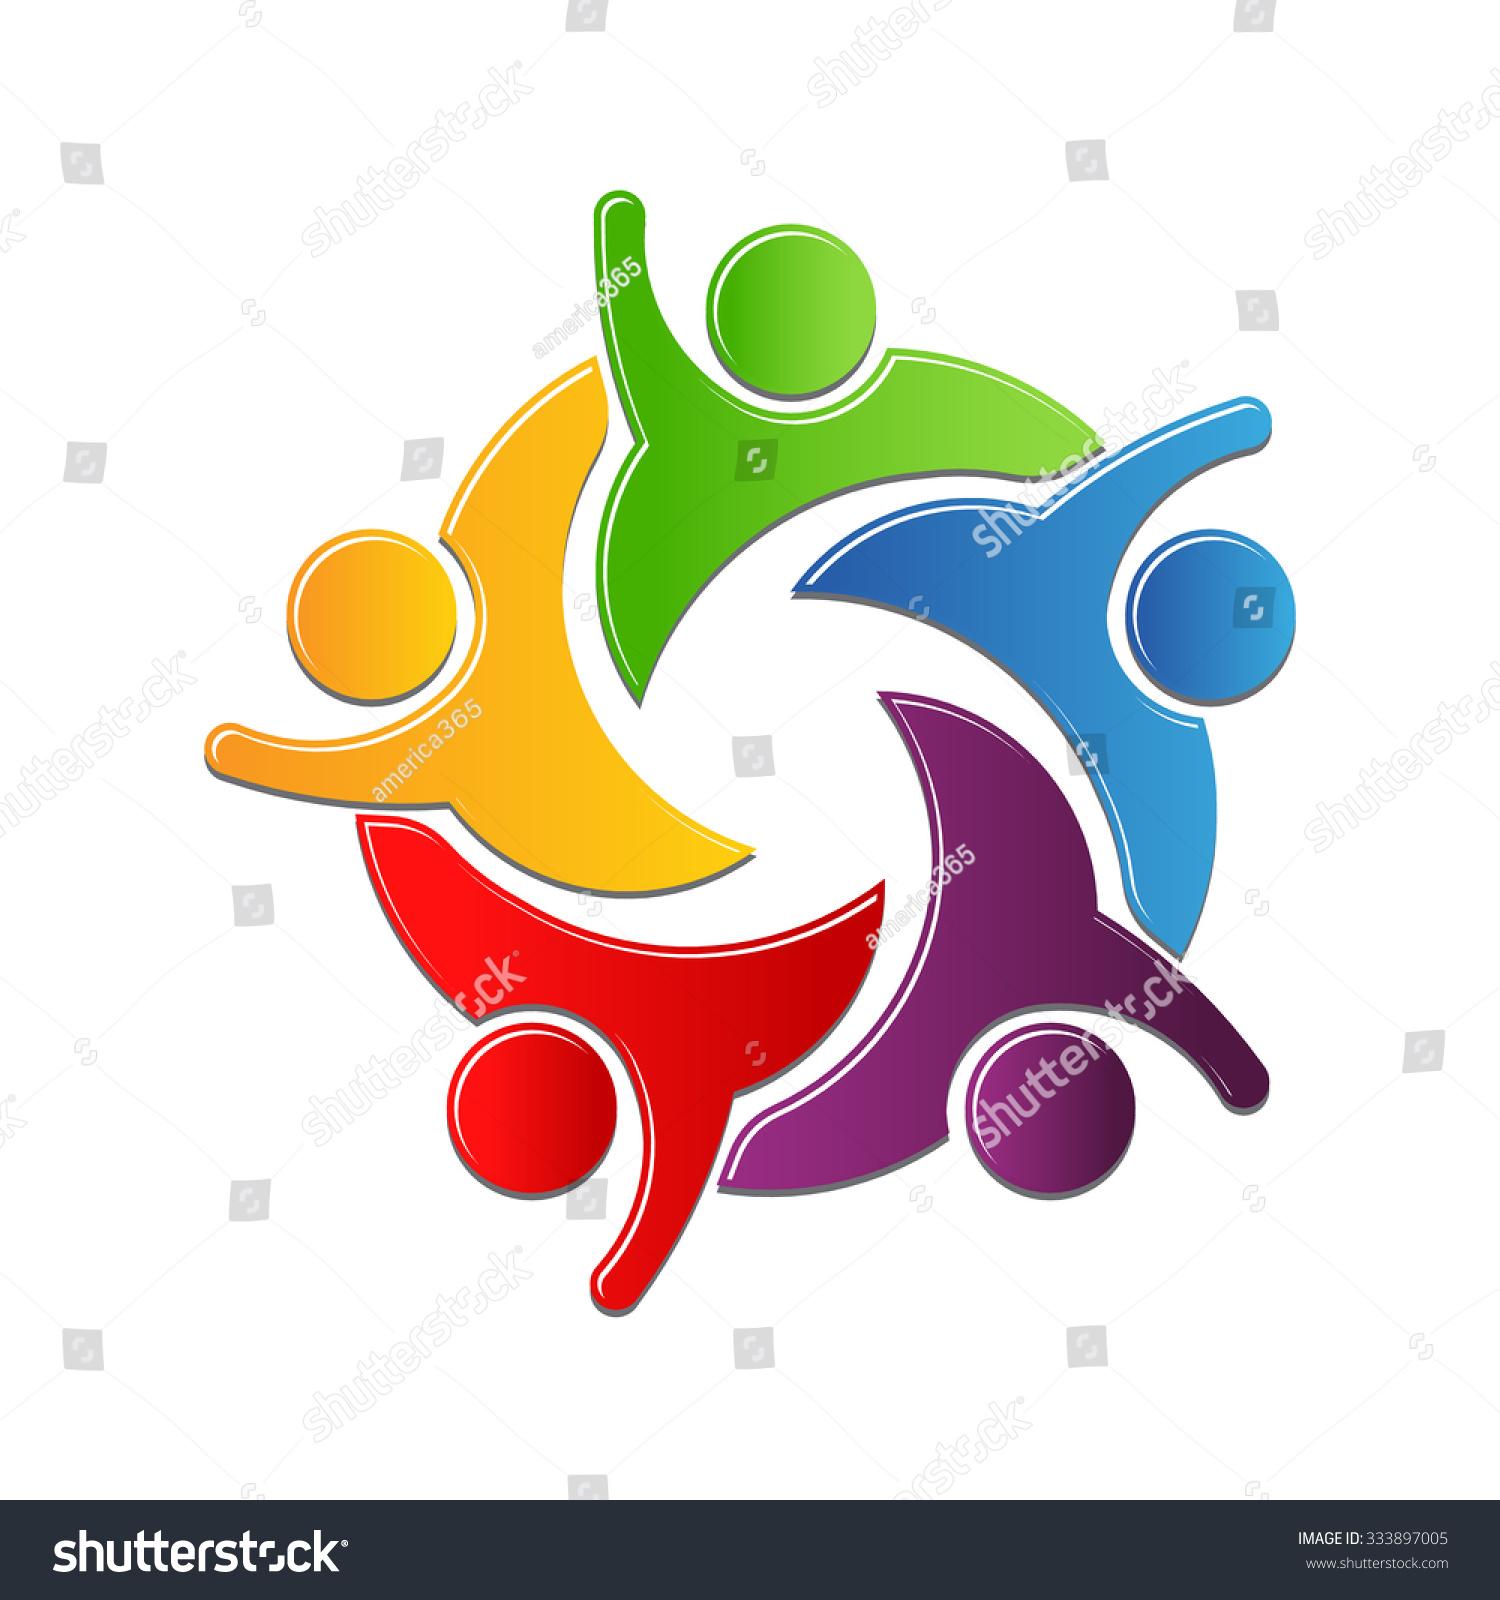 teamwork culture work circle logo design stock vector royalty free